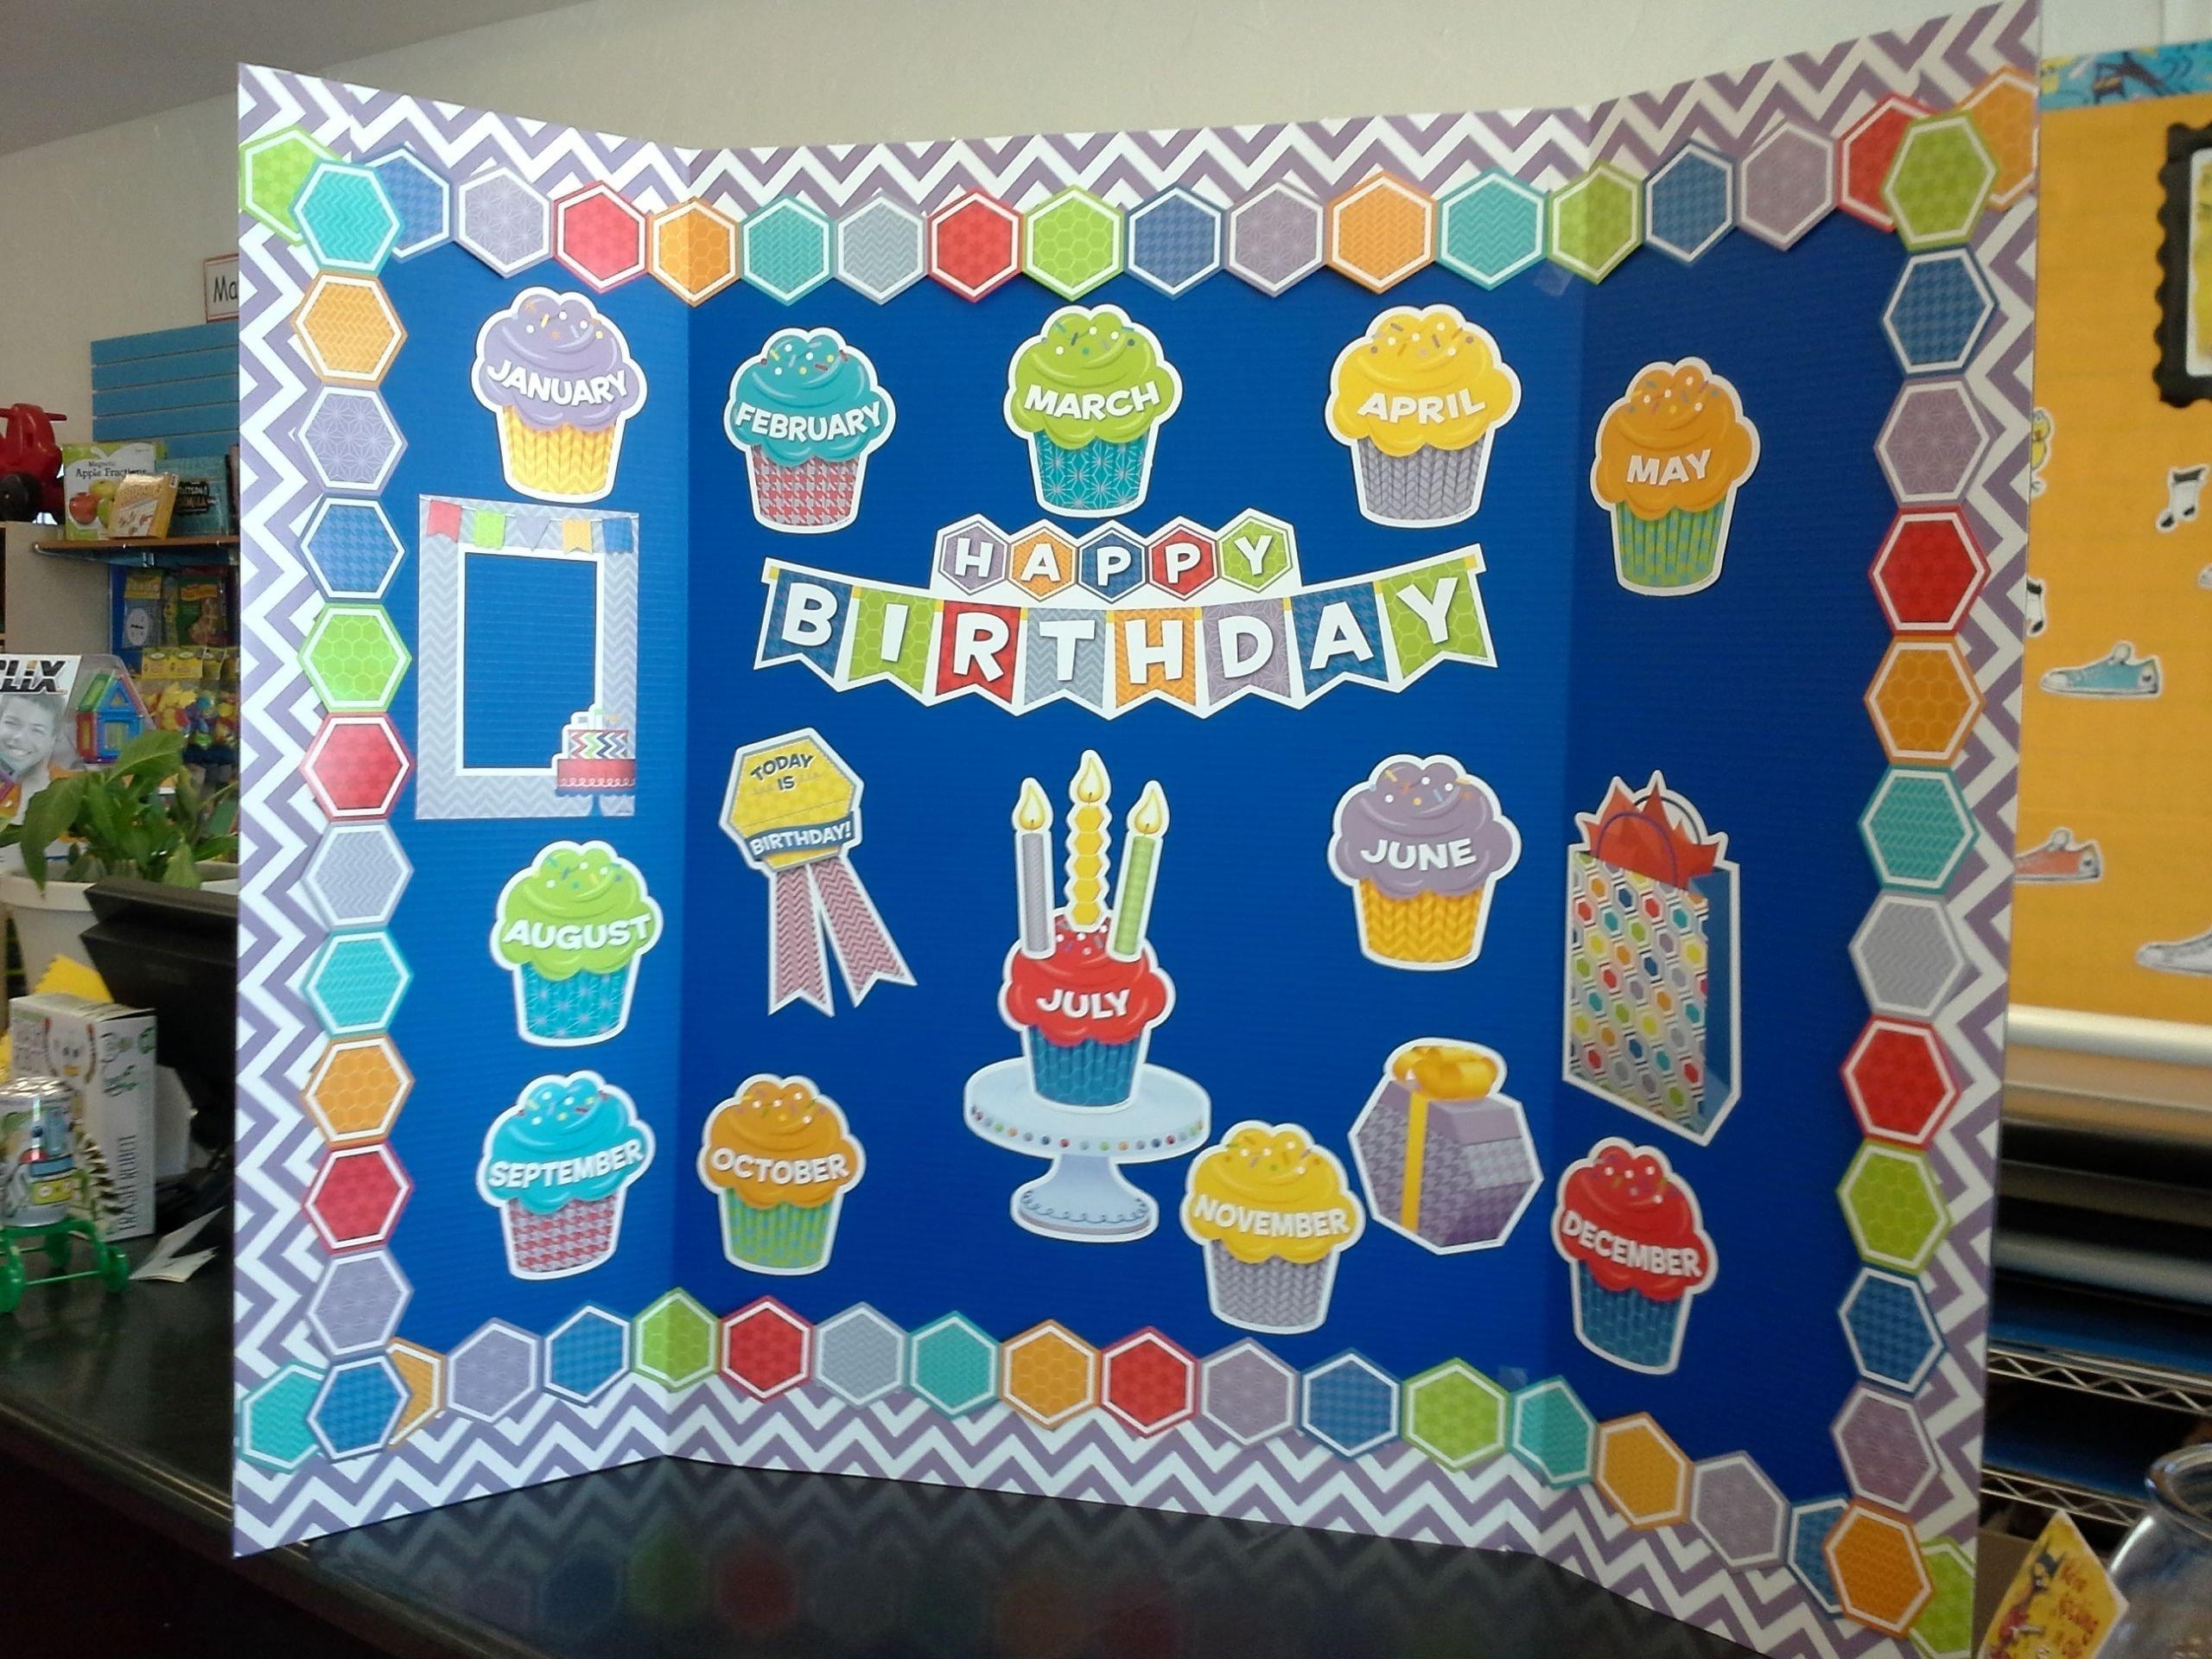 10 Wonderful Happy Birthday Bulletin Board Ideas happy birthday bulletin board idea http teacherparent happy 2020